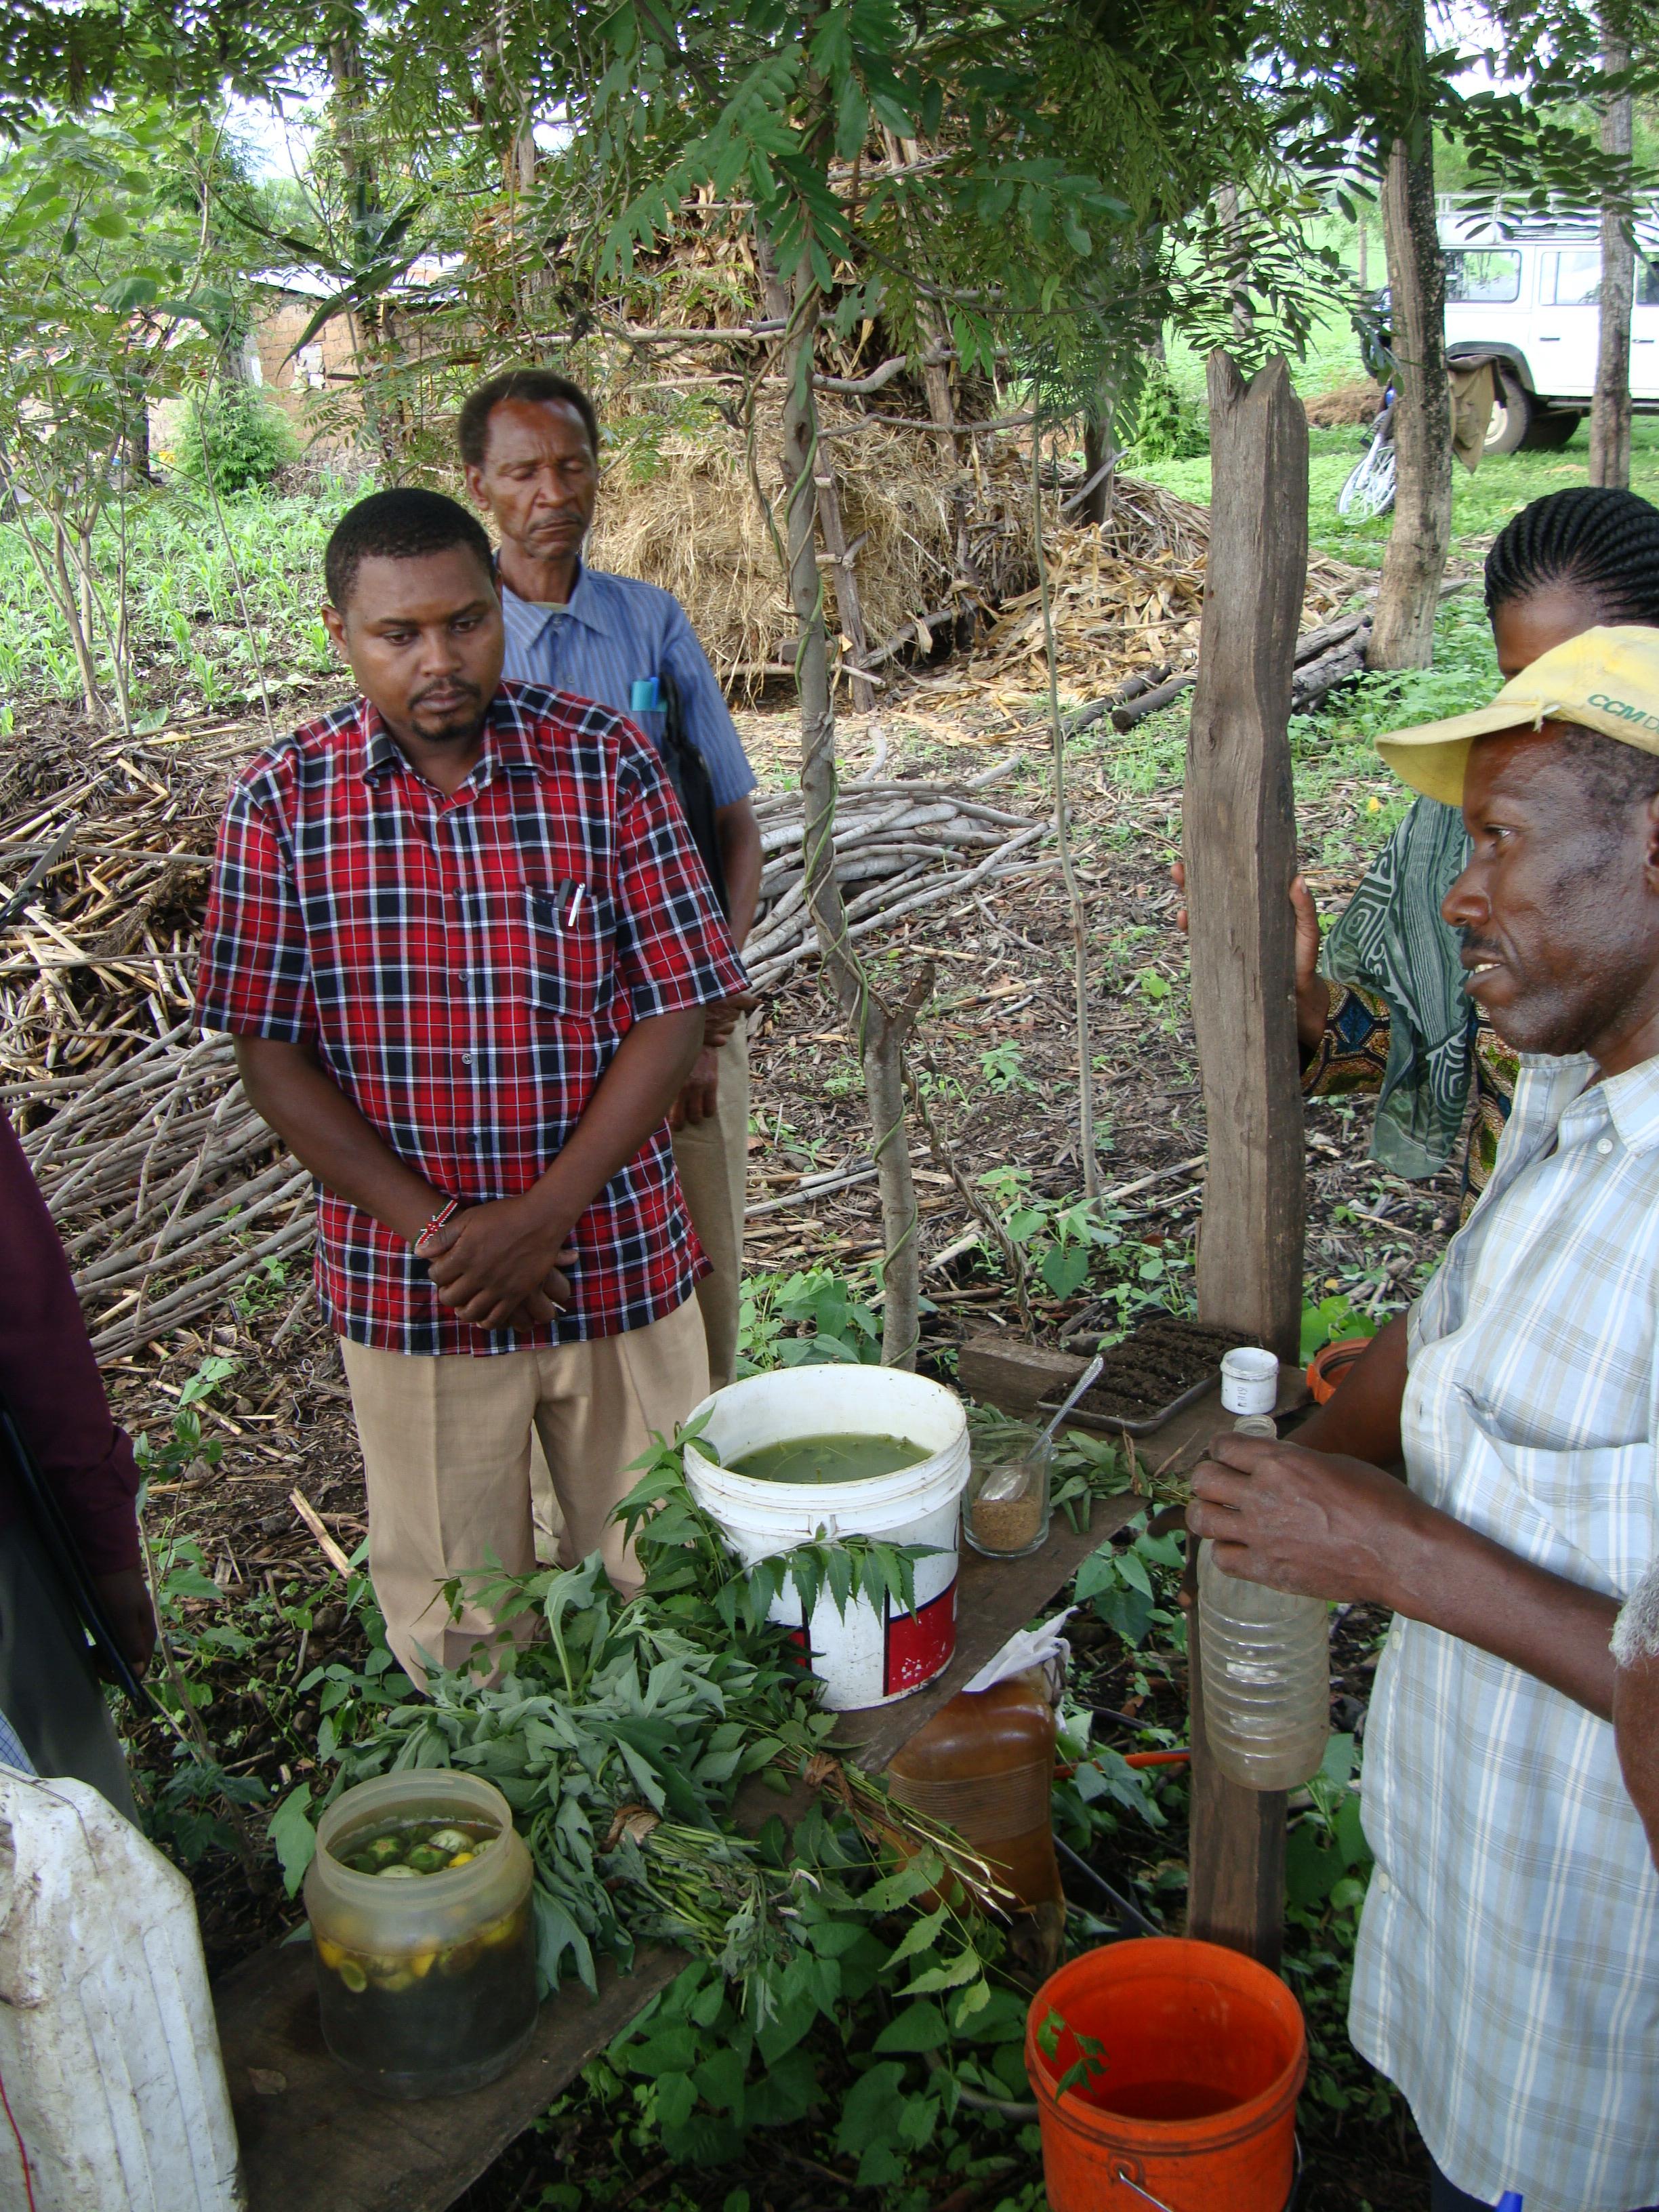 farmers producing botanica pesticides IPM tomato tanzania MAKINGBOTATNICALS0664 by stoepfer